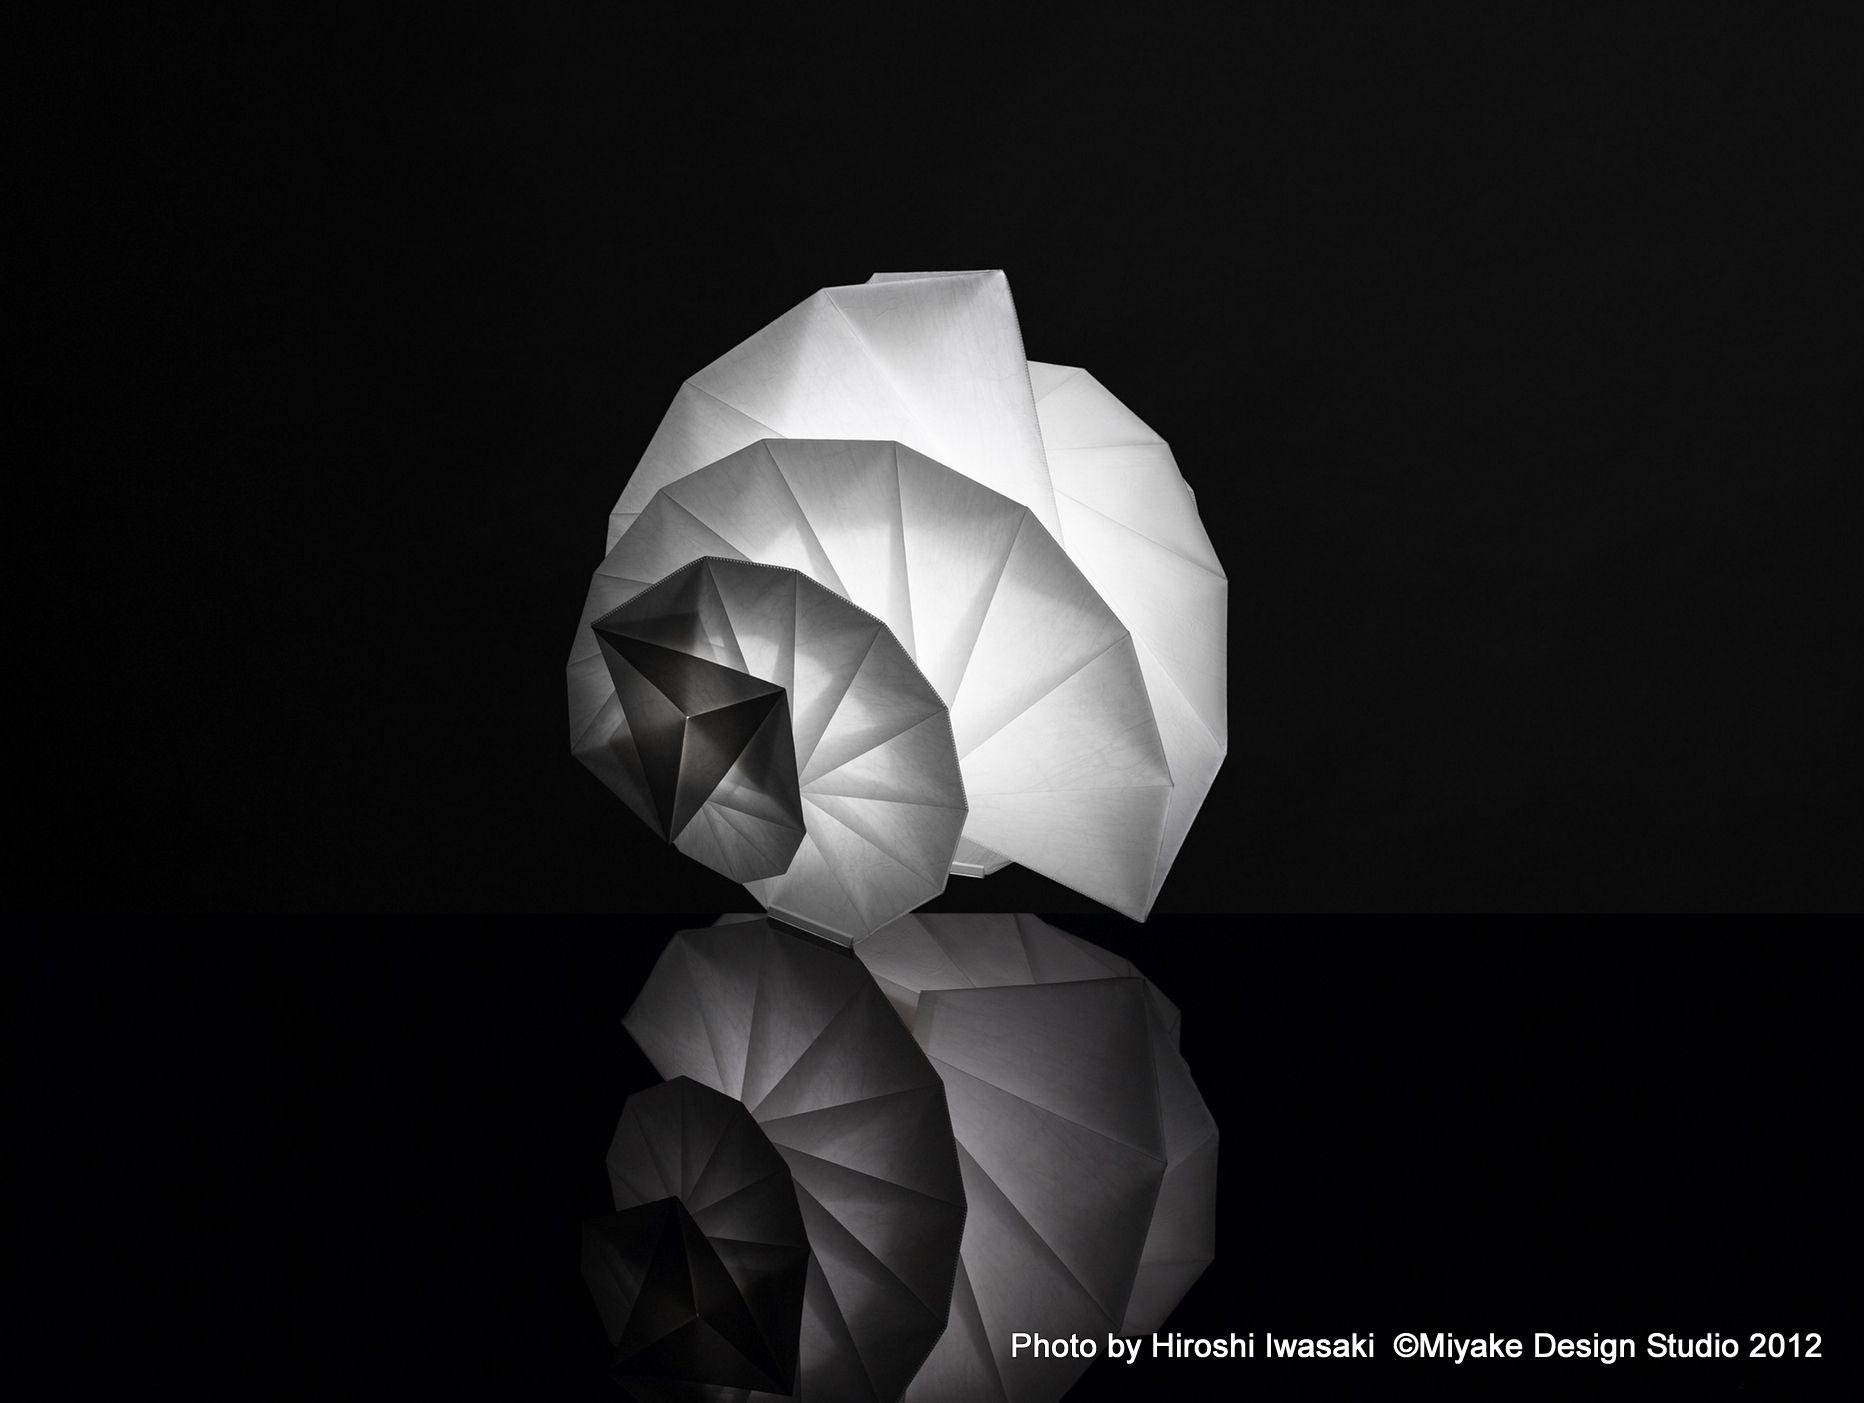 table lamp floor lamp mendori mini by artemide design issey miyake. Black Bedroom Furniture Sets. Home Design Ideas